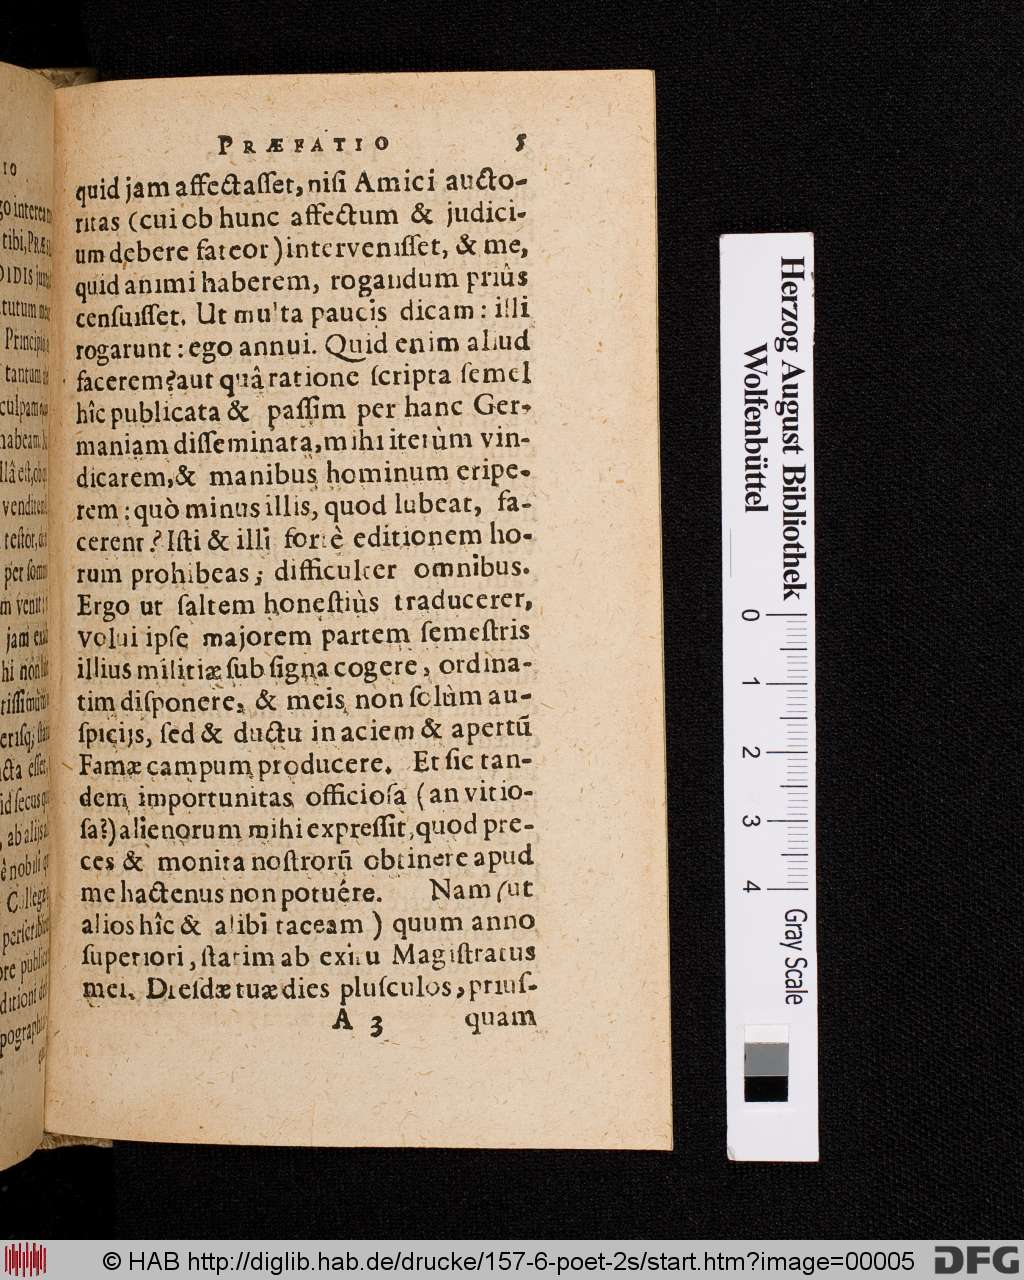 http://diglib.hab.de/drucke/157-6-poet-2s/00005.jpg